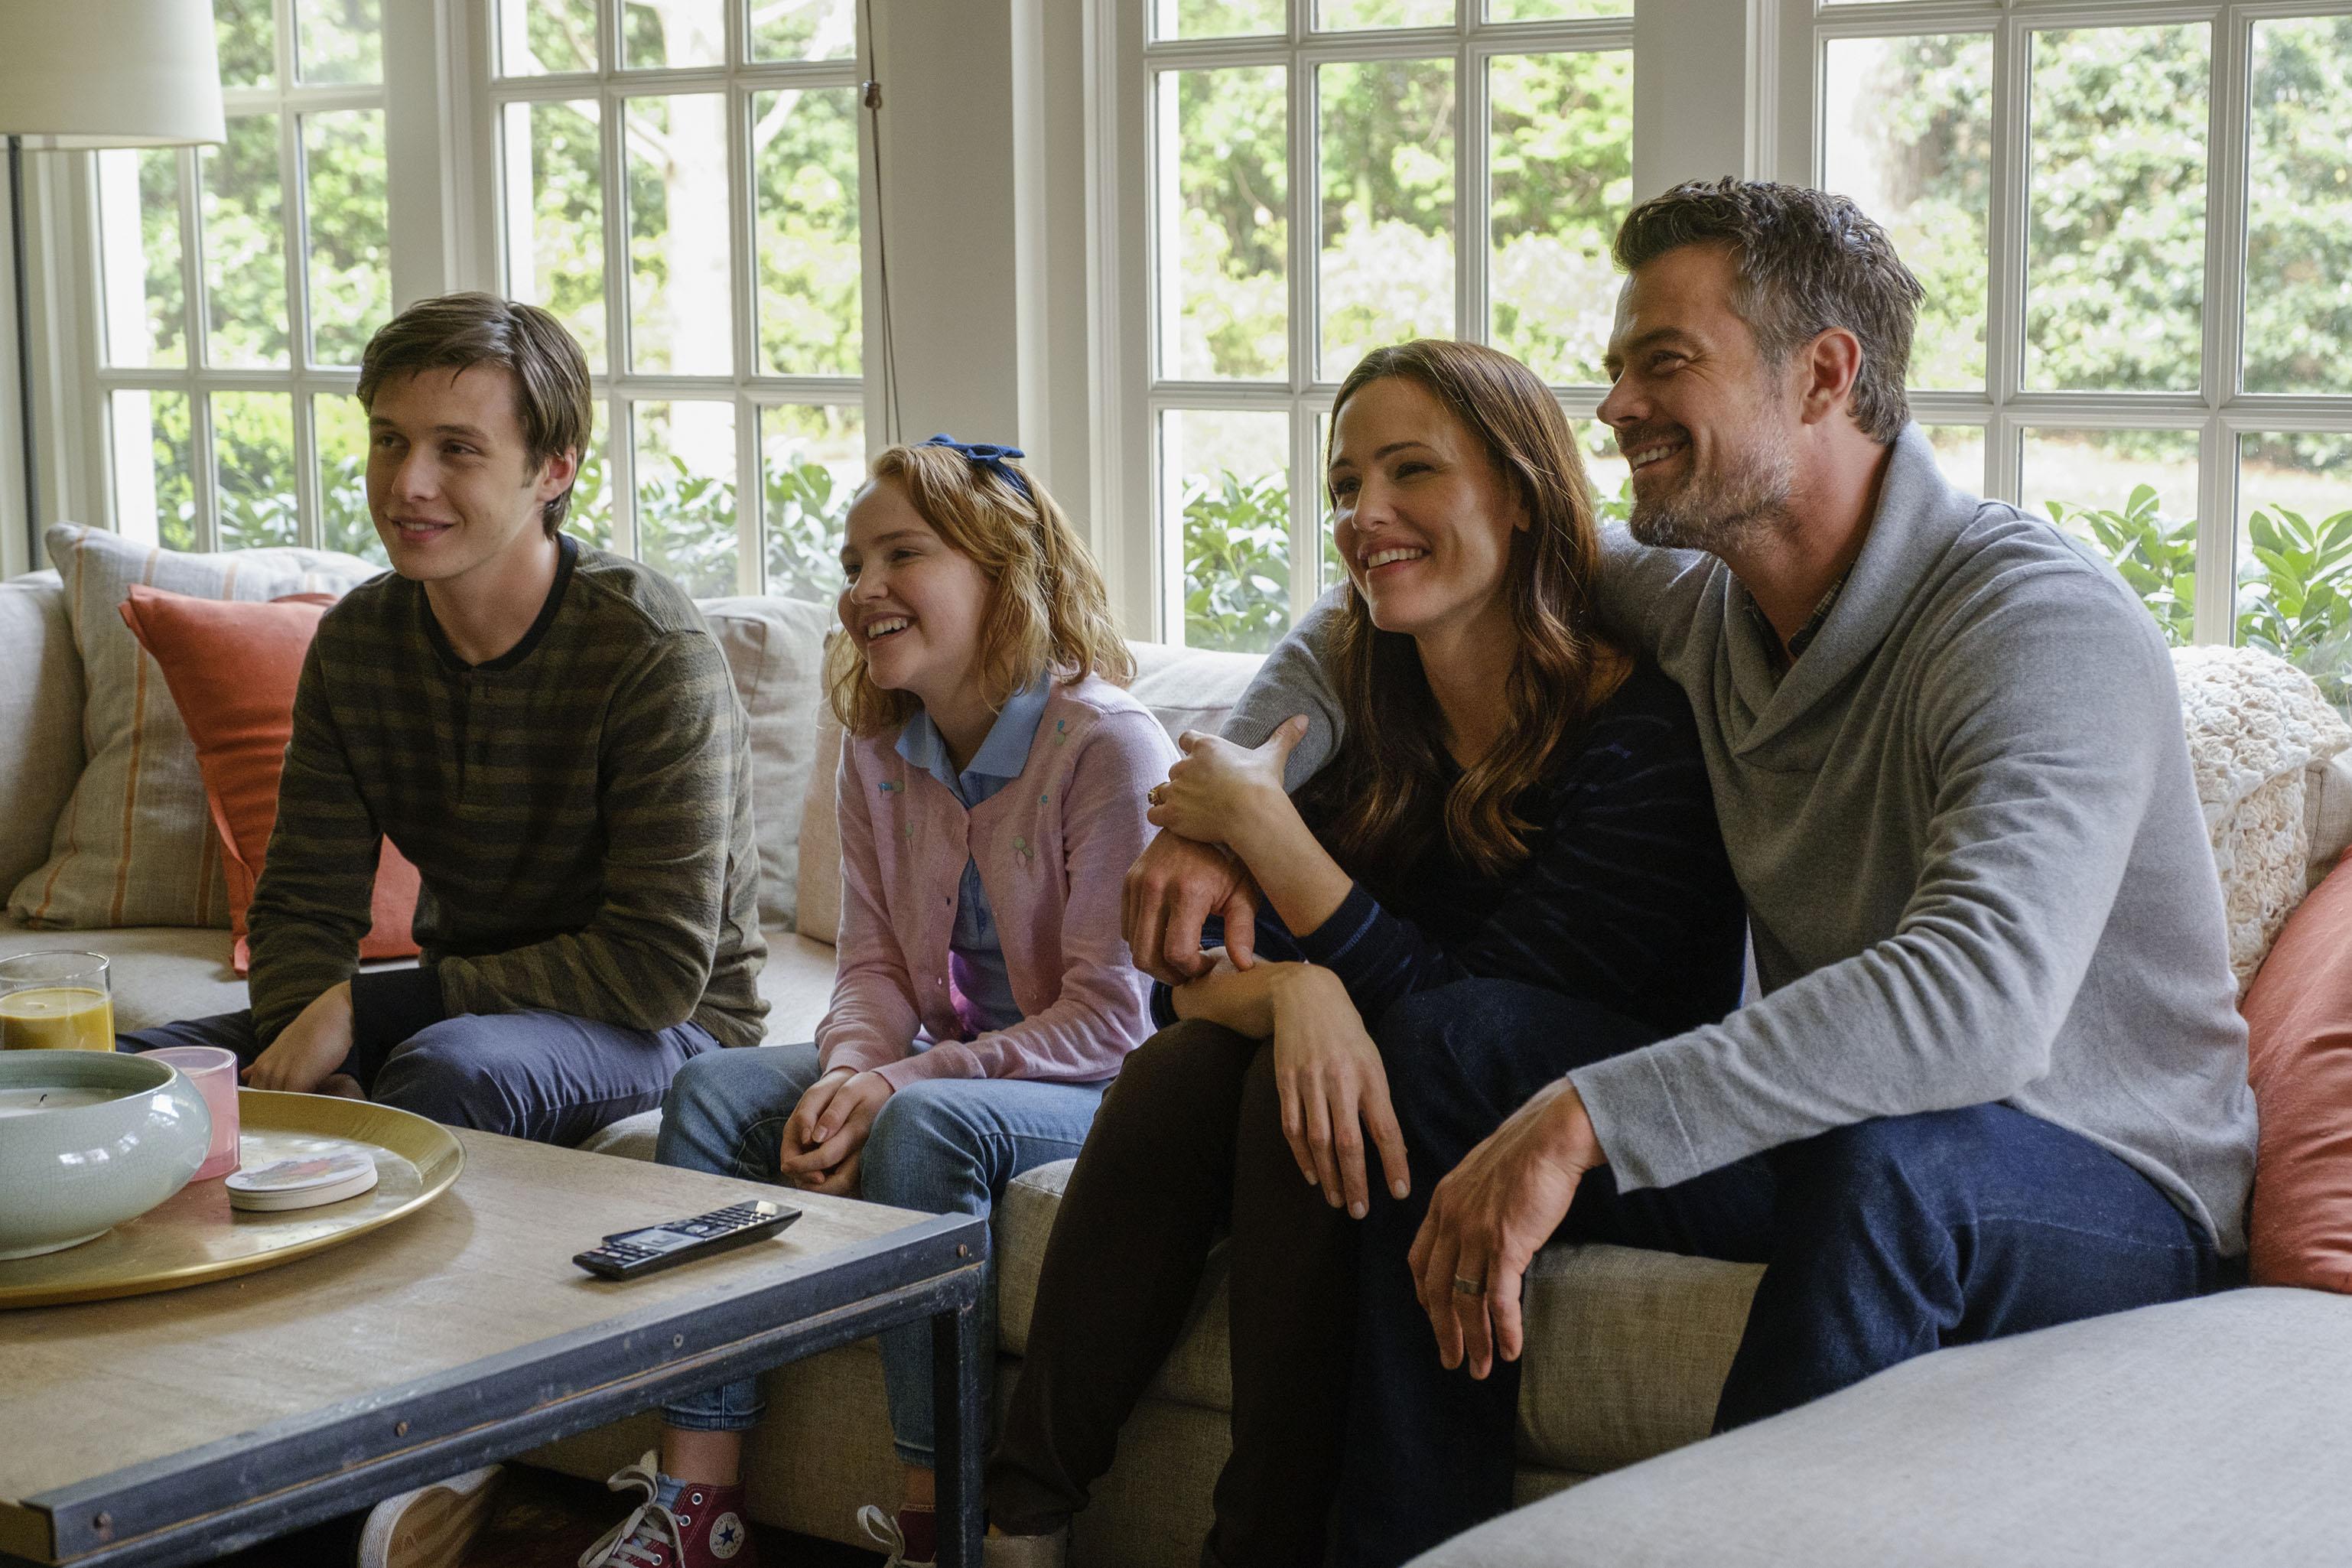 Nick Robinson (Simon), Talitha Bateman (Nora), Jennifer Garner (Emily), and Josh Duhamel (Jack) star in Twentieth Century Fox's LOVE, SIMON